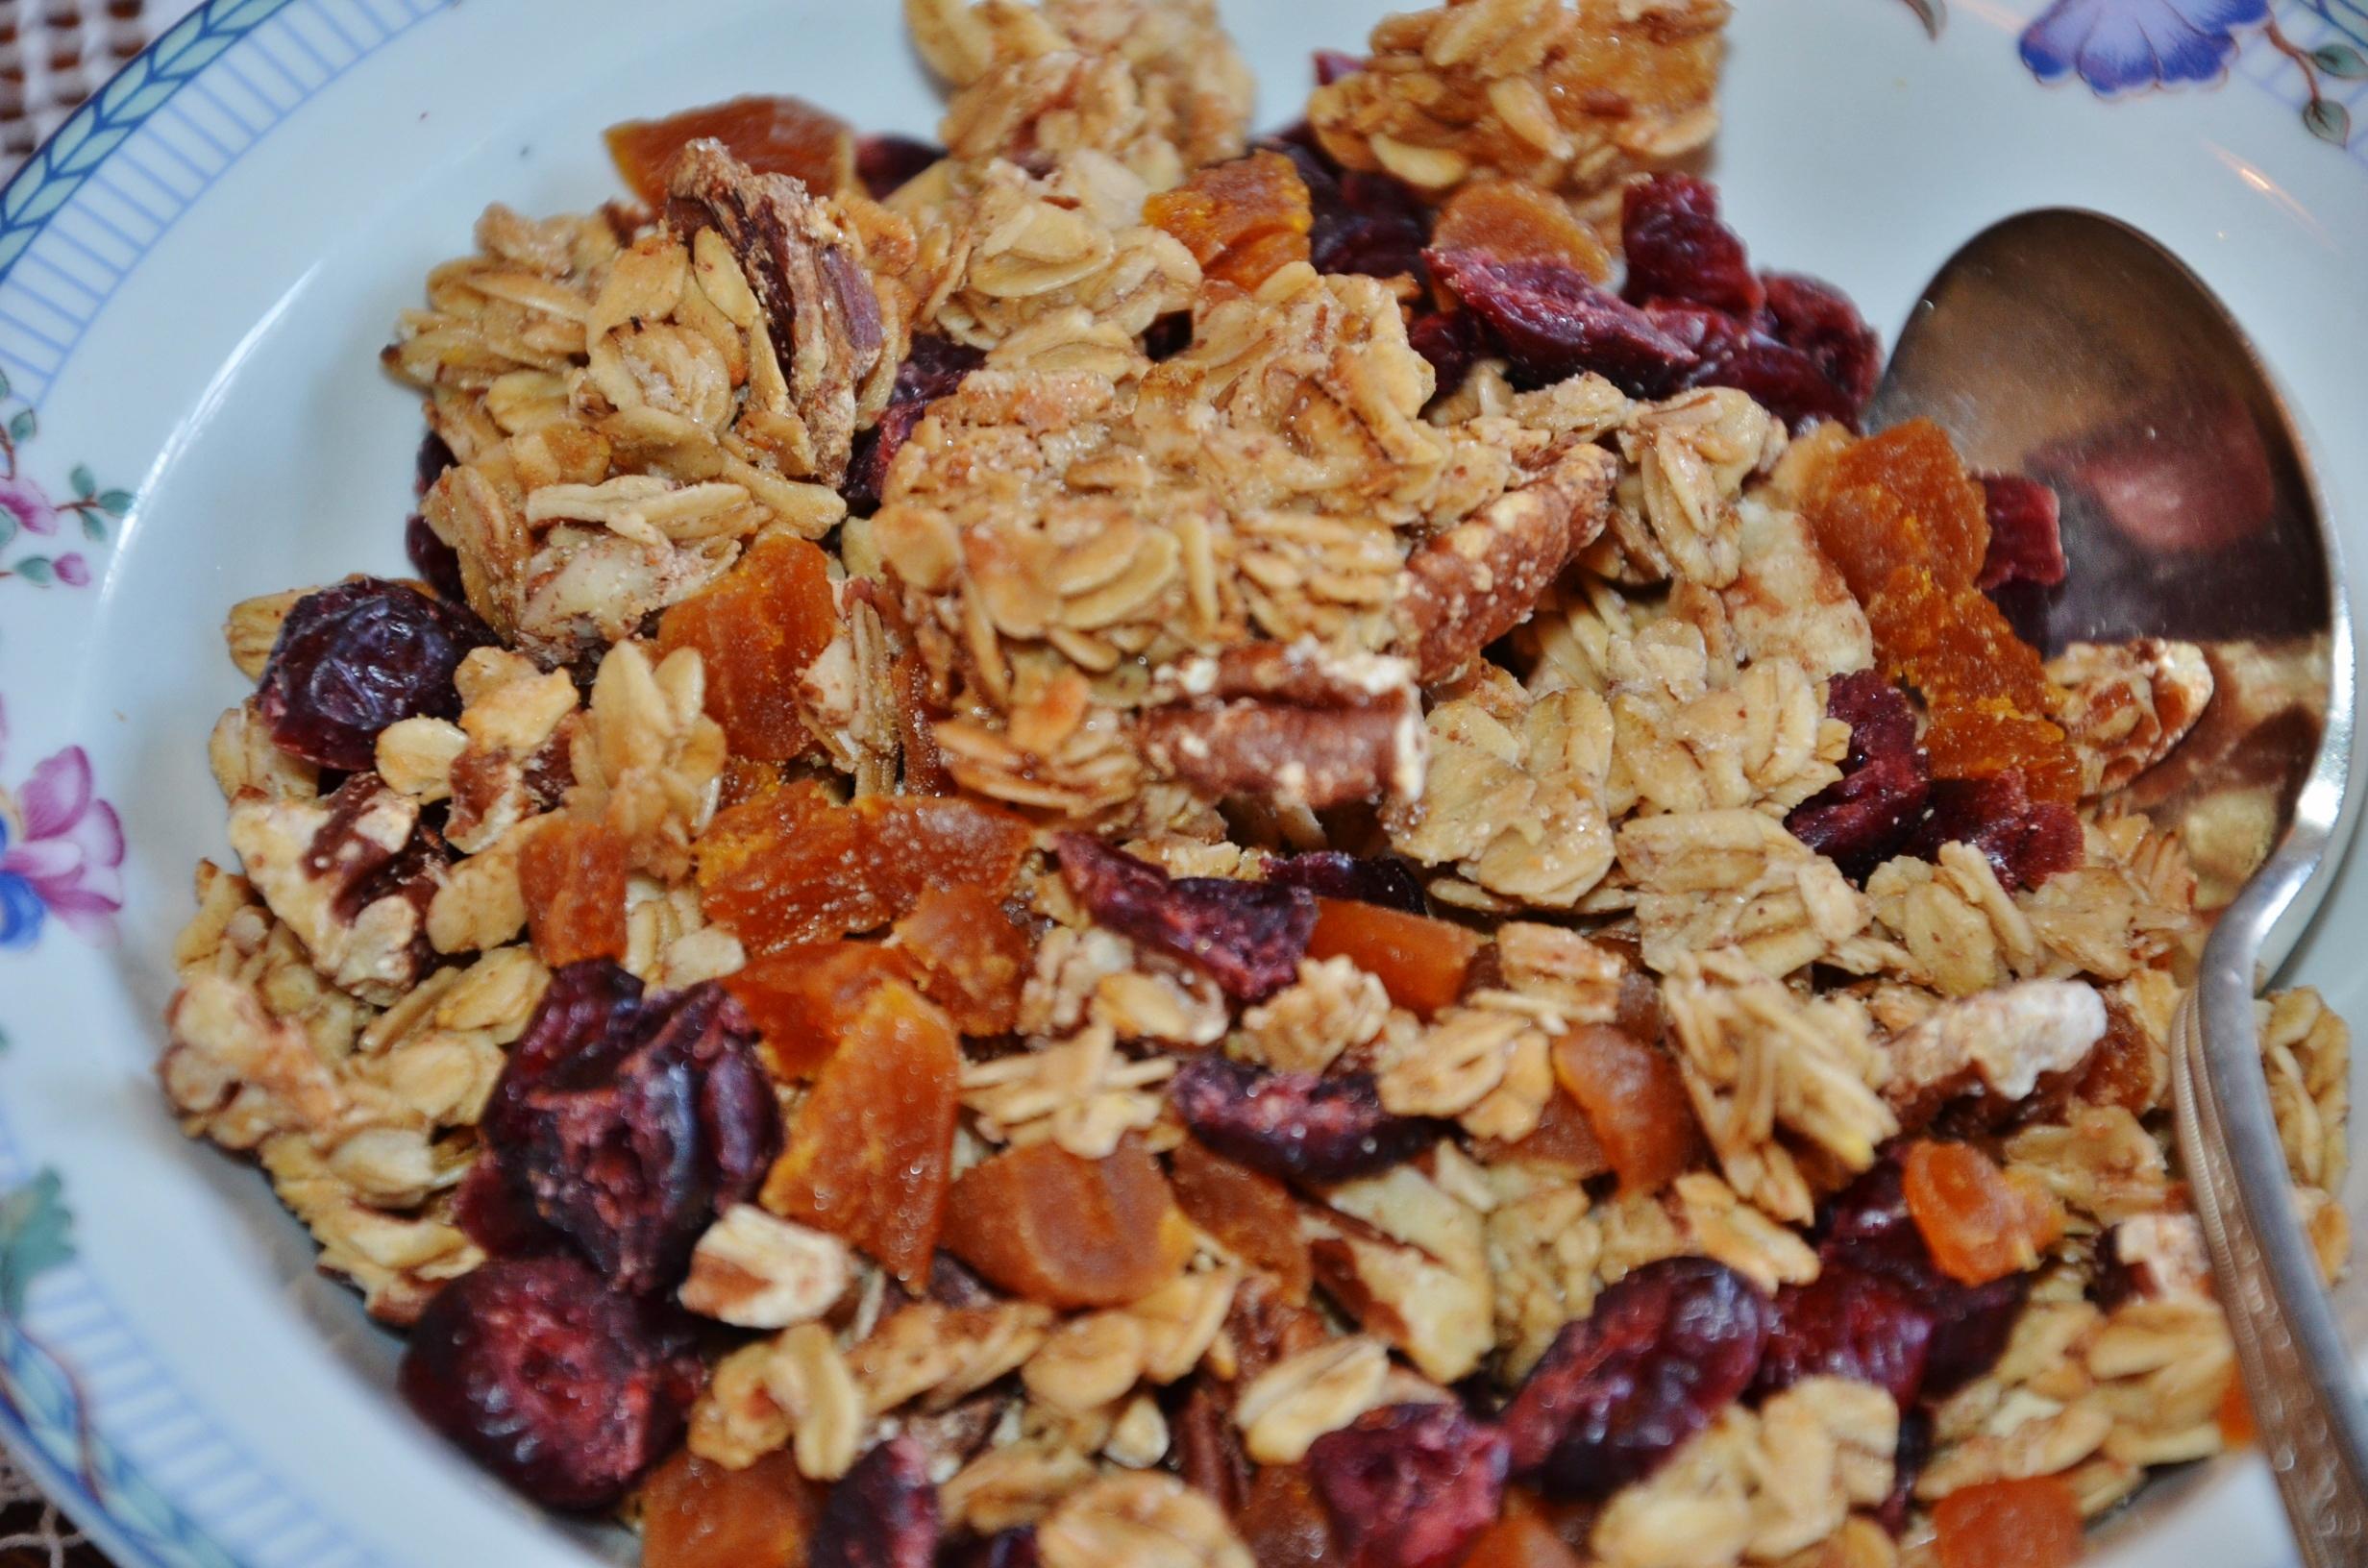 Cereal vegan pecan granola w dried fruit gracehill bed and vegan pecan and dried fruit homemade granola ccuart Gallery